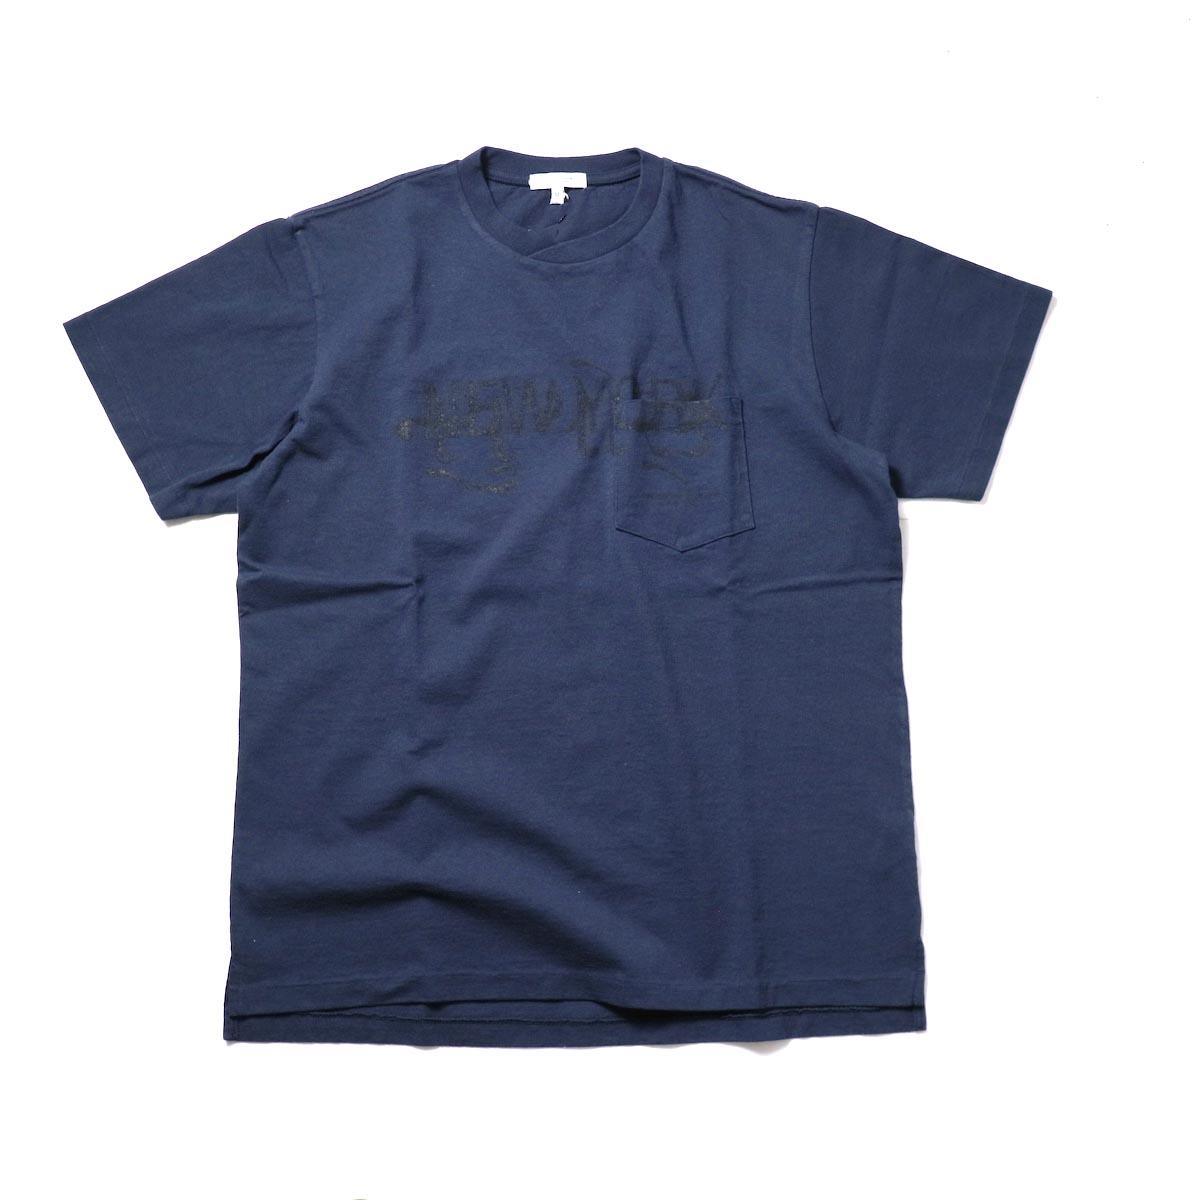 Engineered Garments / Printed Cross Crew Neck T-shirt -New York (Dk.Navy)